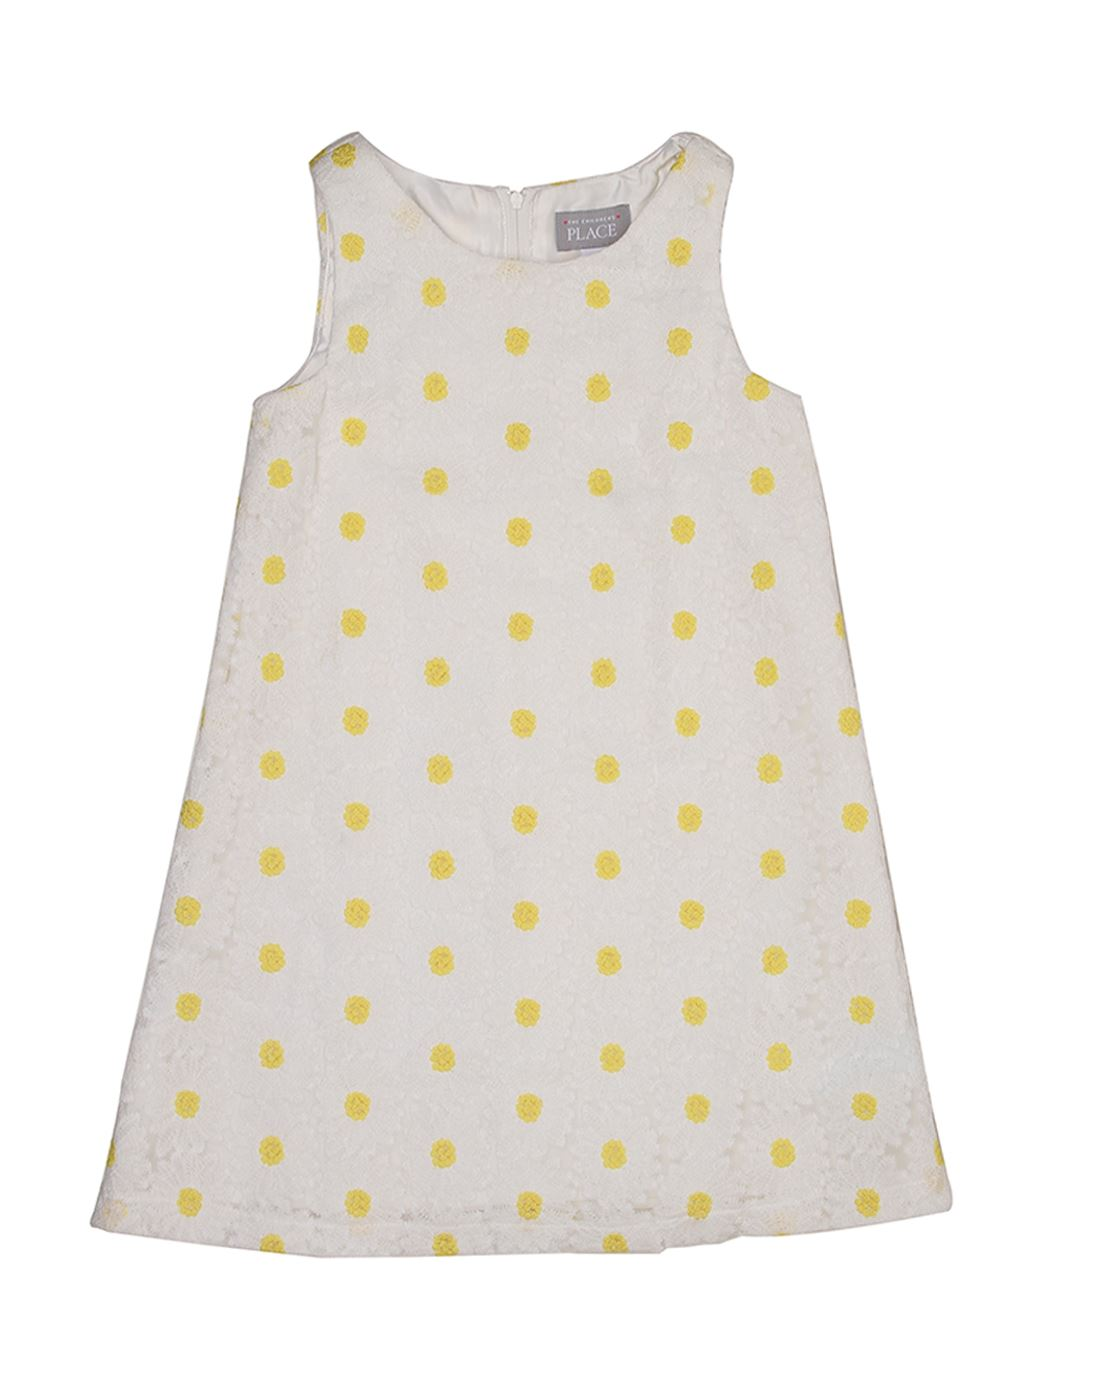 The Children's Place Girls Casual Wear Polka Print Dress